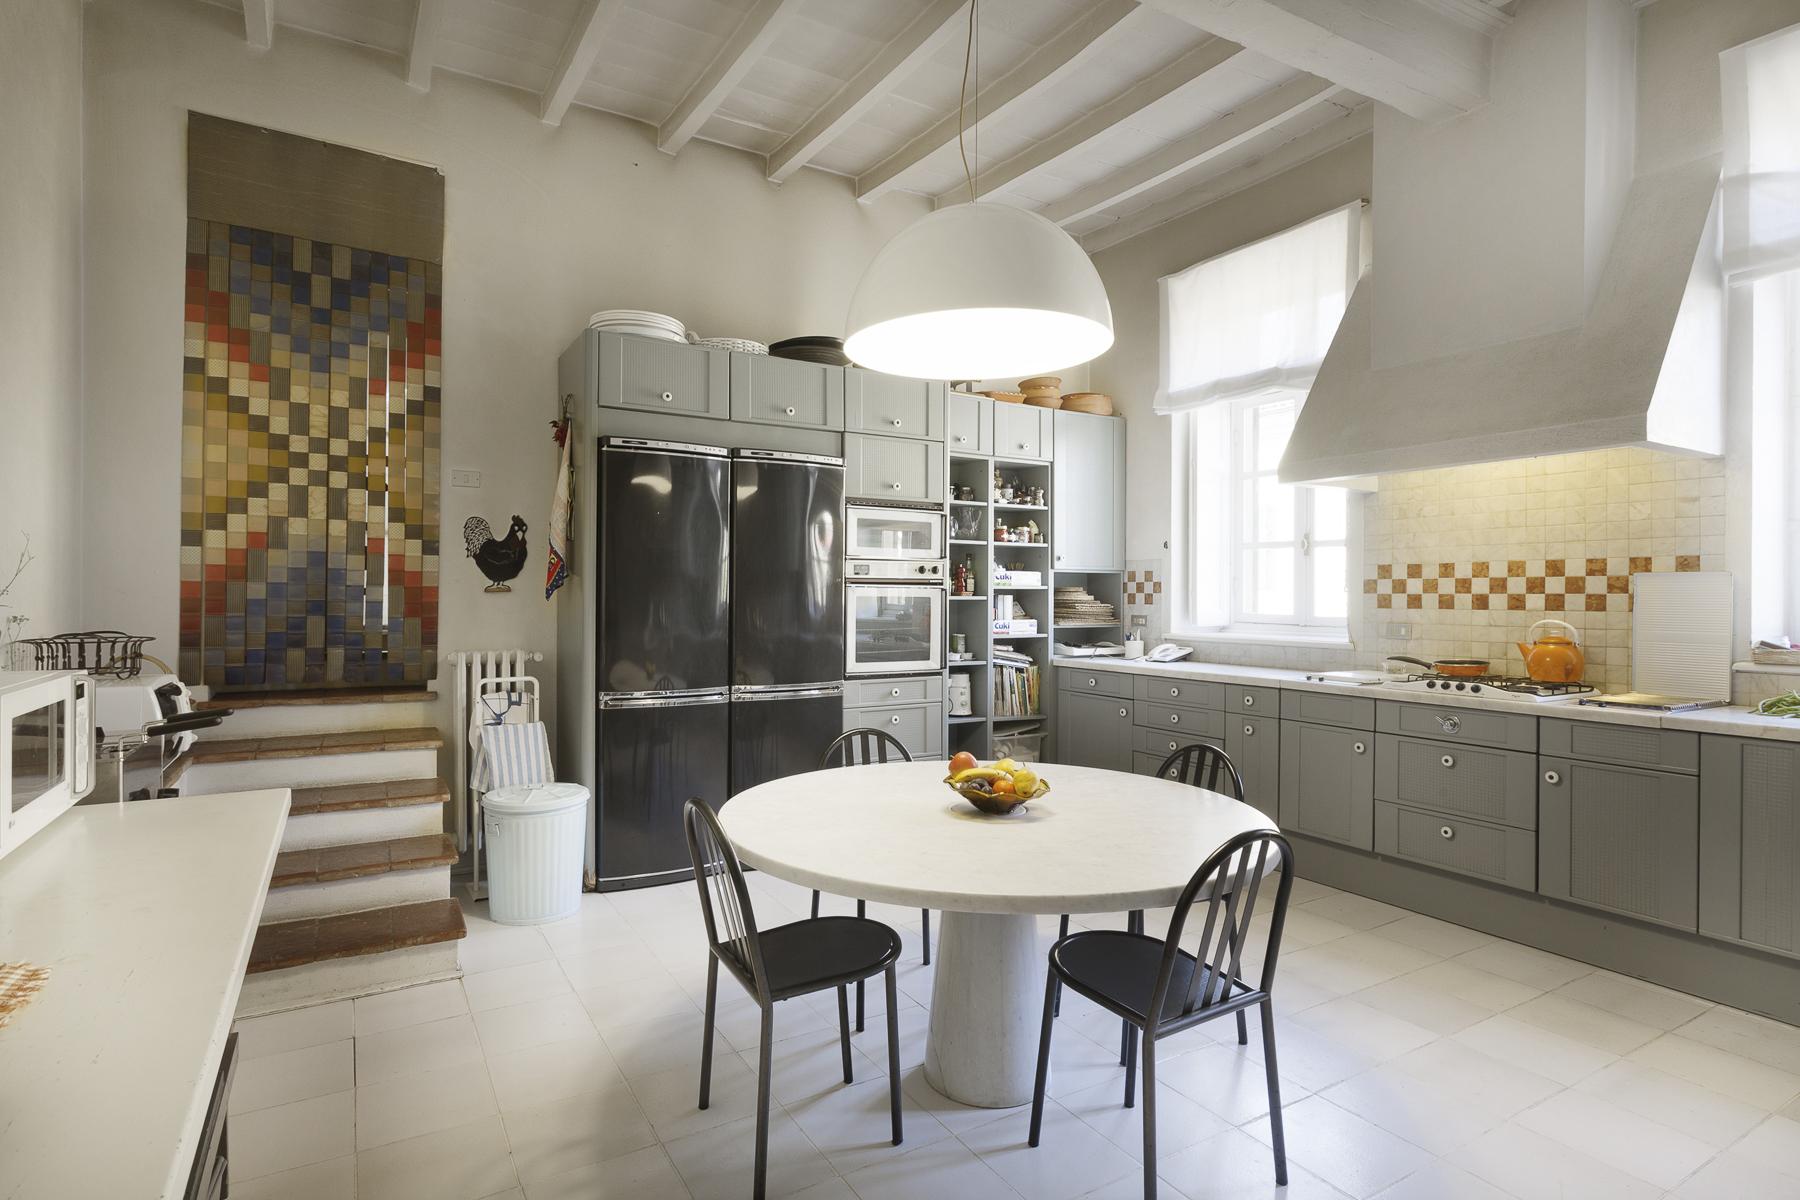 Additional photo for property listing at A fascinating XVII century Villa in Revigliasco Hill Strada Moncalieri Revigliasco, Turin 10024 Italie